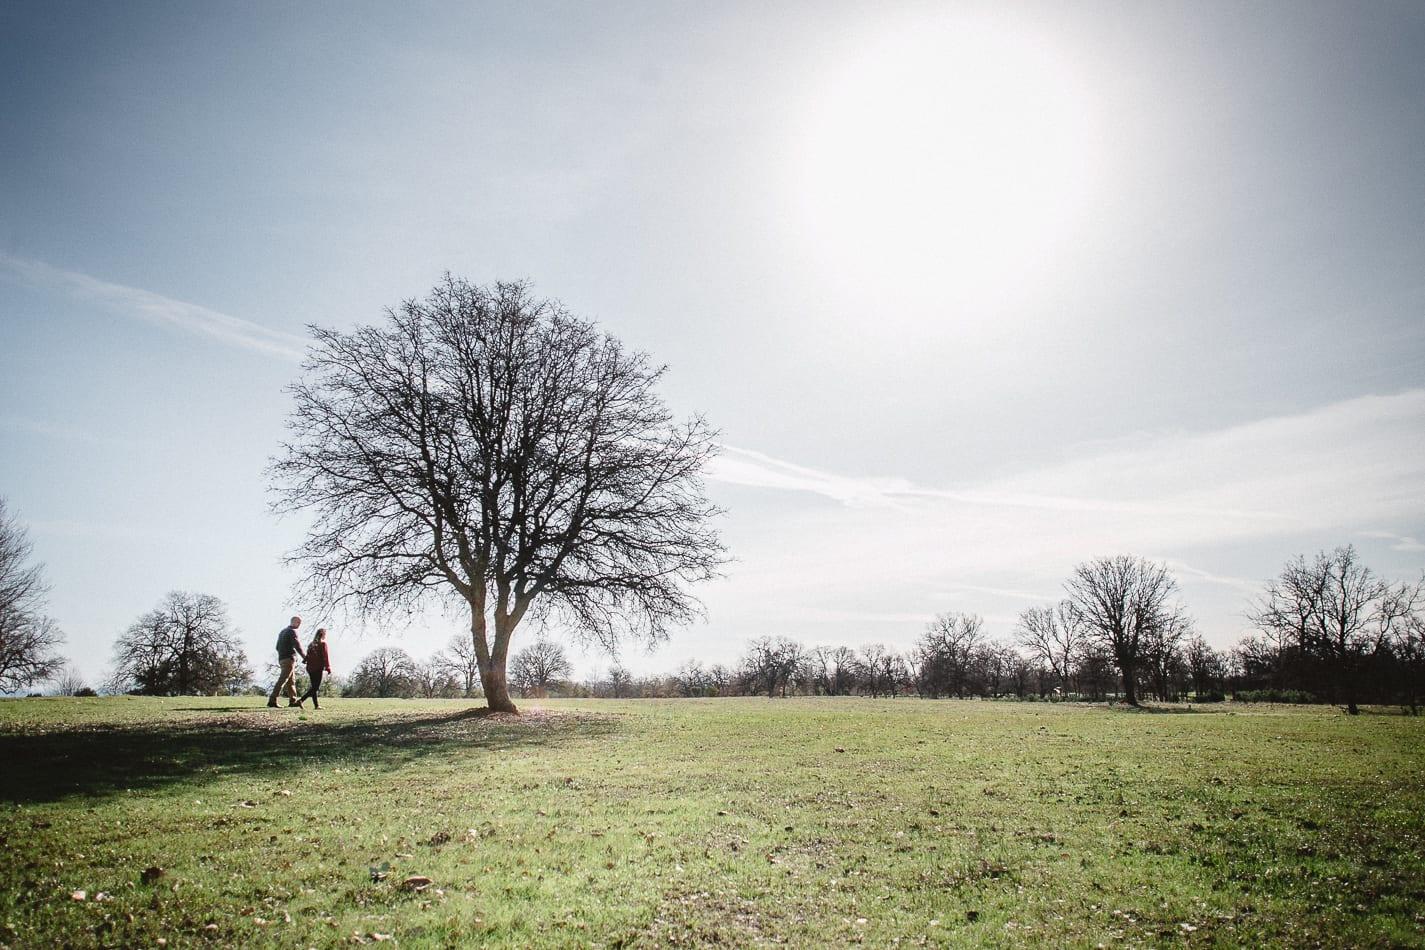 jonah-natalie-lema-ranch-redding-california-engagement-photographer-1